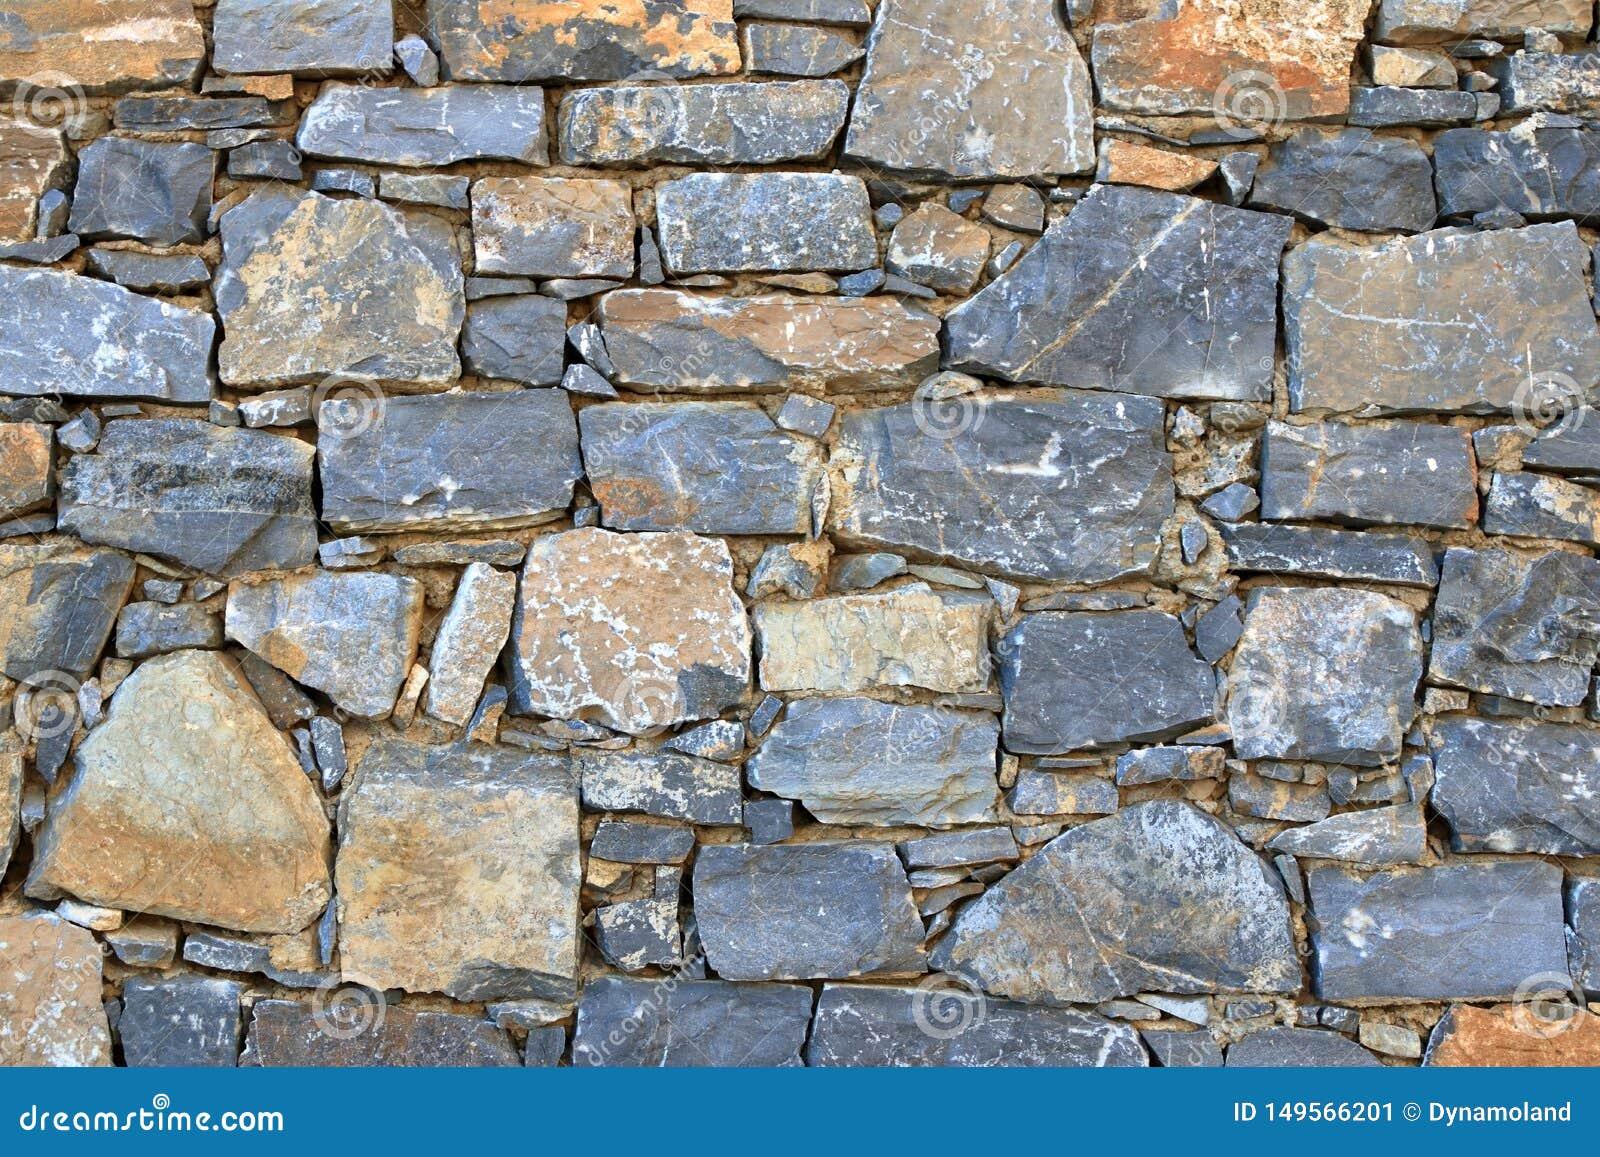 Big gray wall from stone bricks